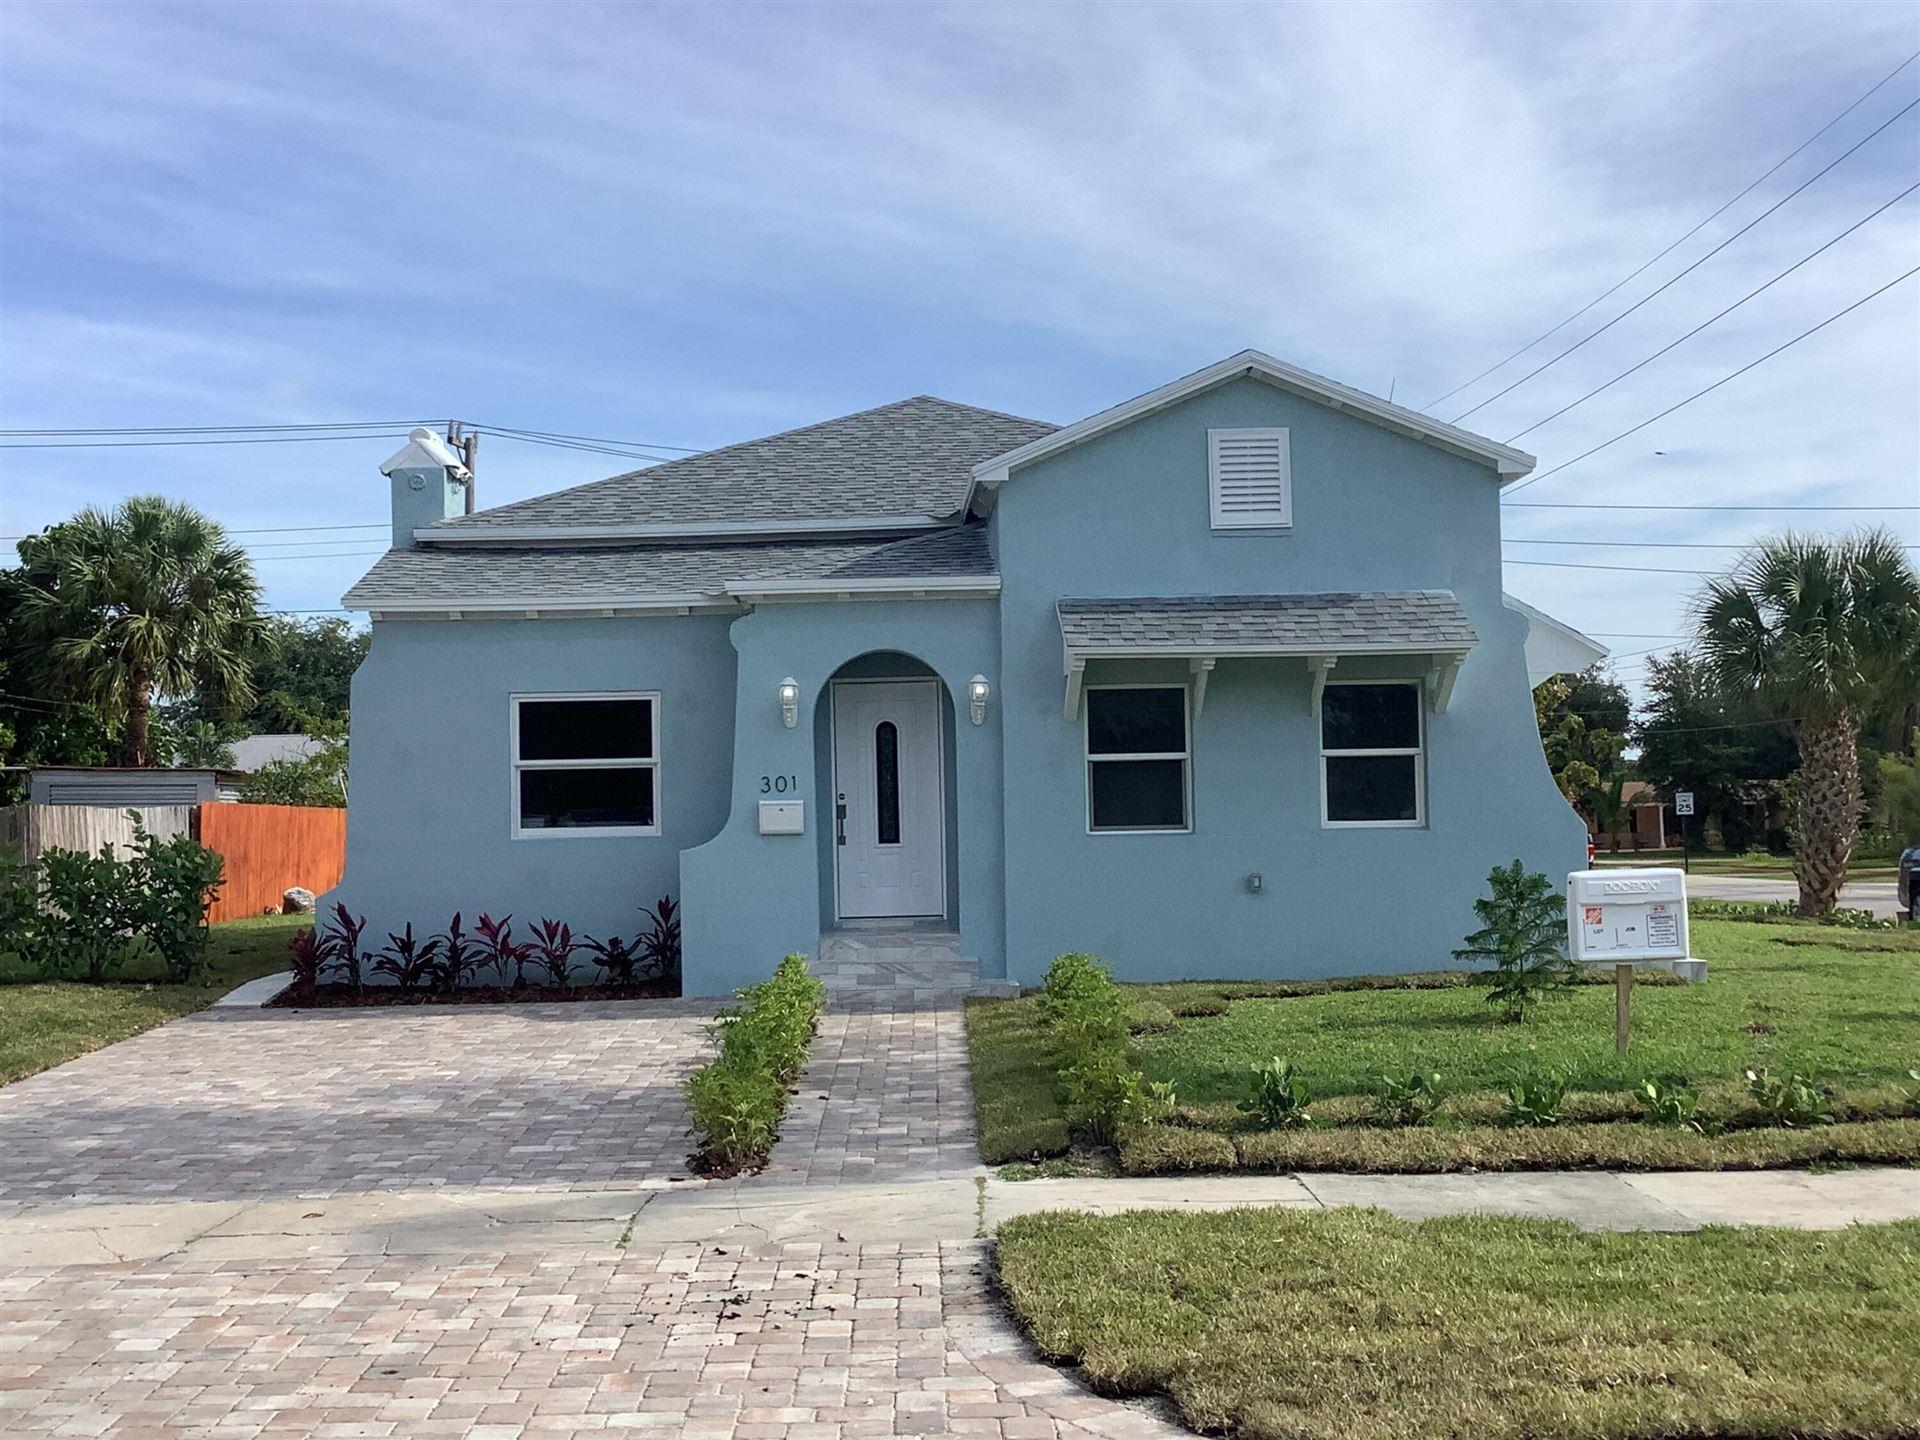 301 Hawthorne Drive, West Palm Beach, FL 33403 - #: RX-10712033